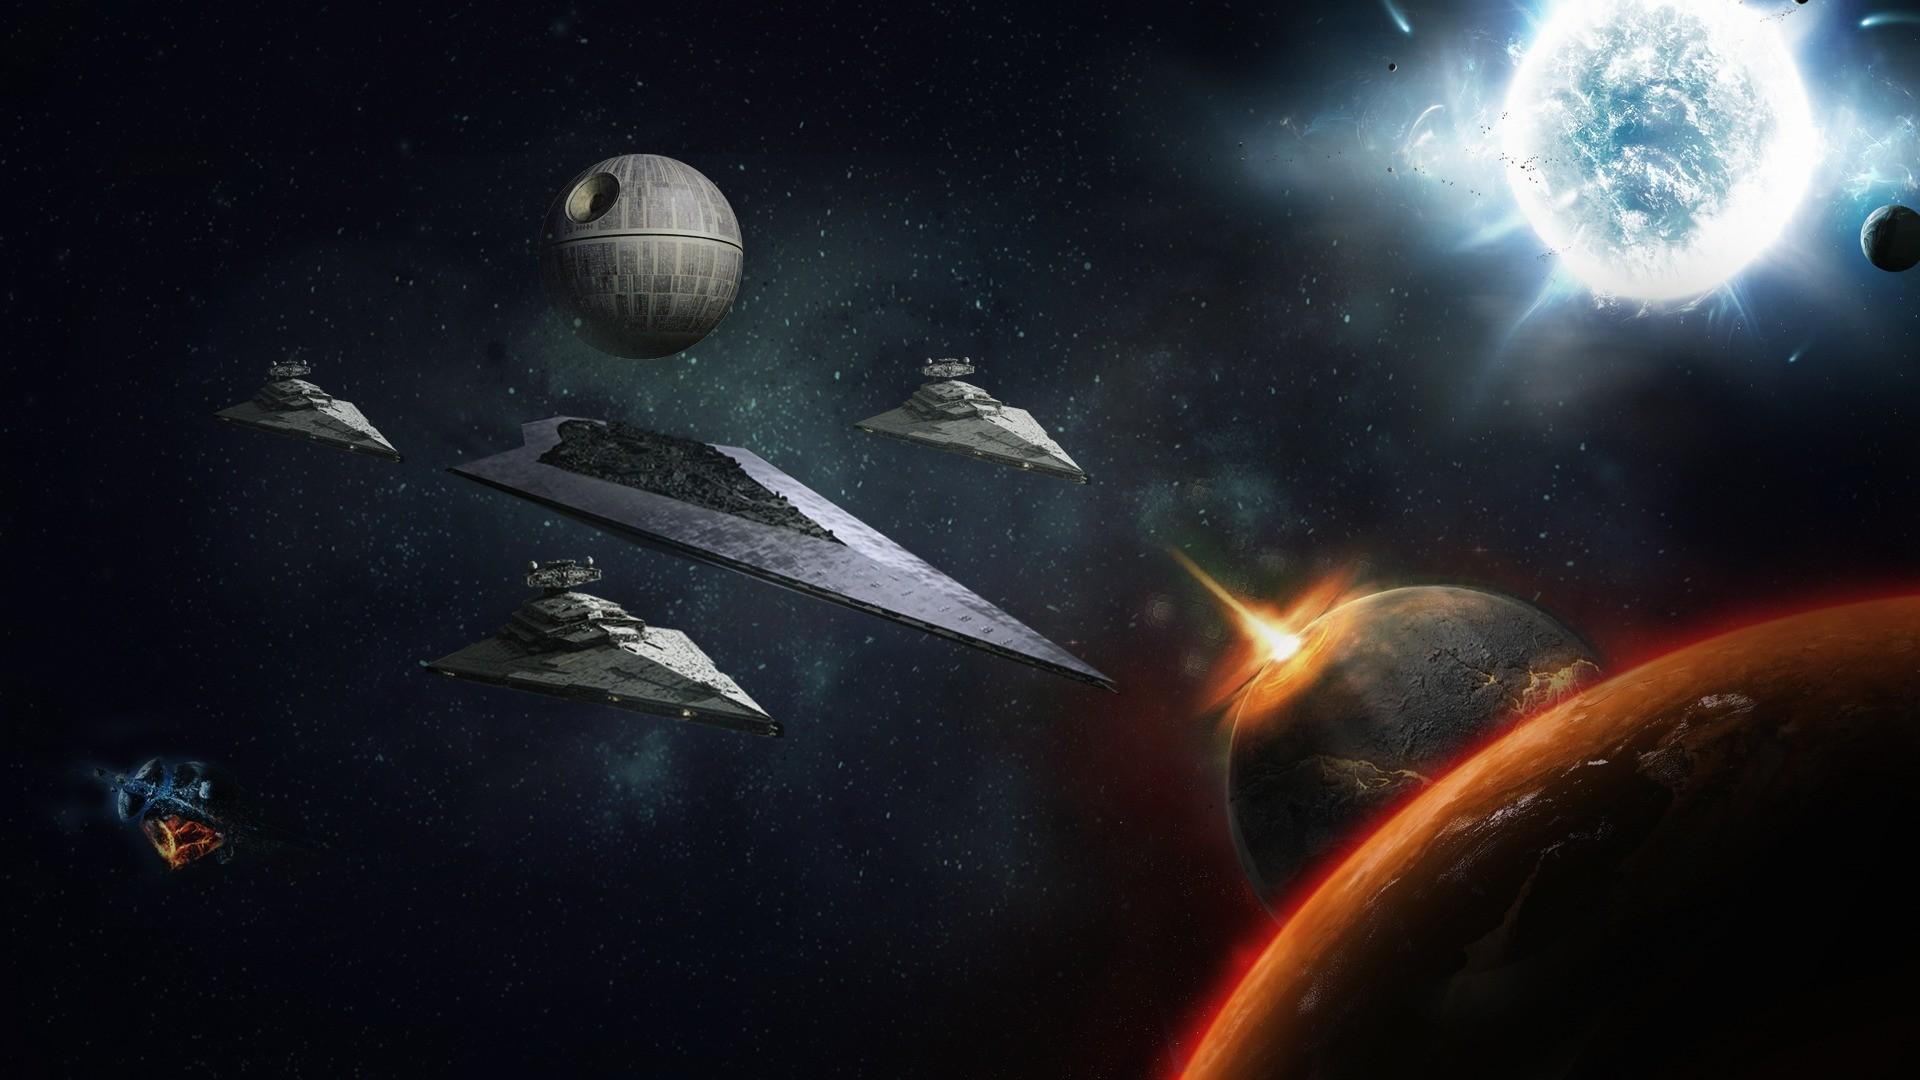 Star Wars death star fantasy game planet space starship star 1920x1080